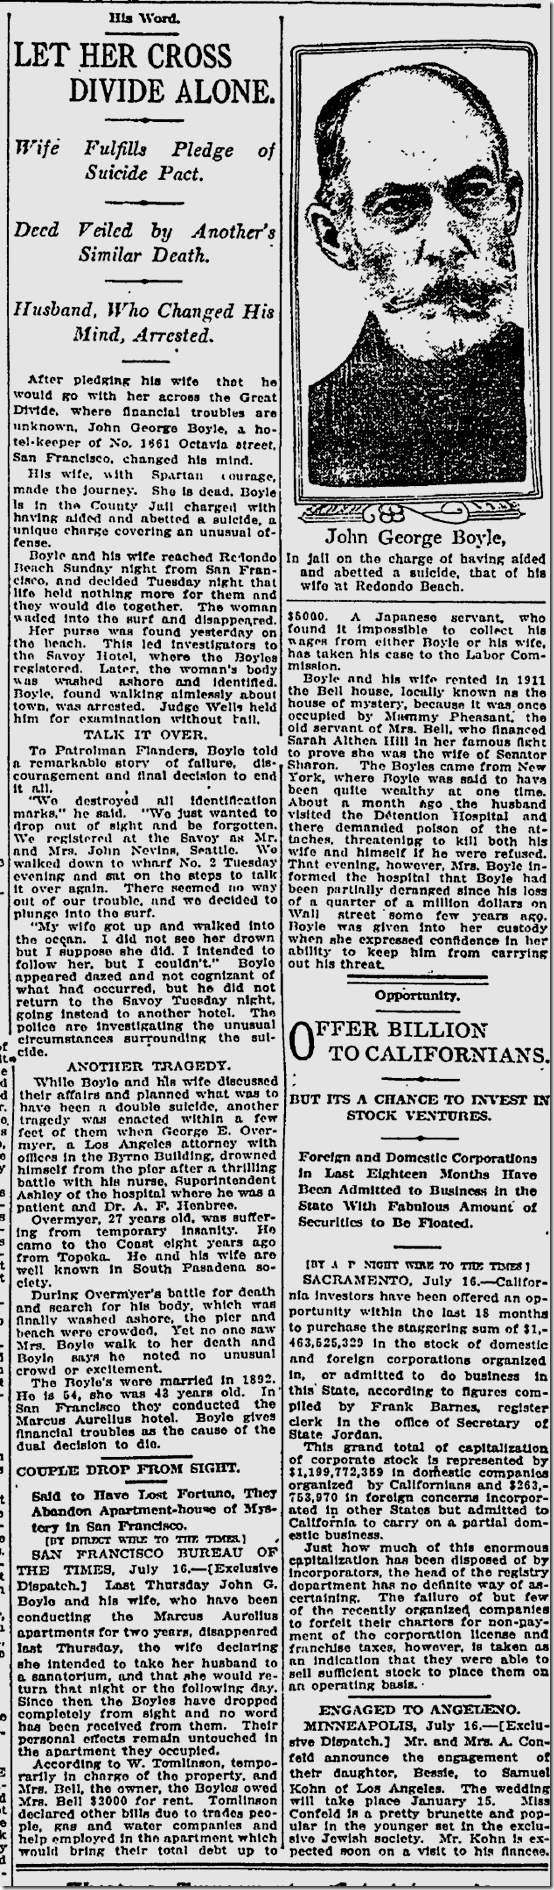 July 17, 1913, Suicide